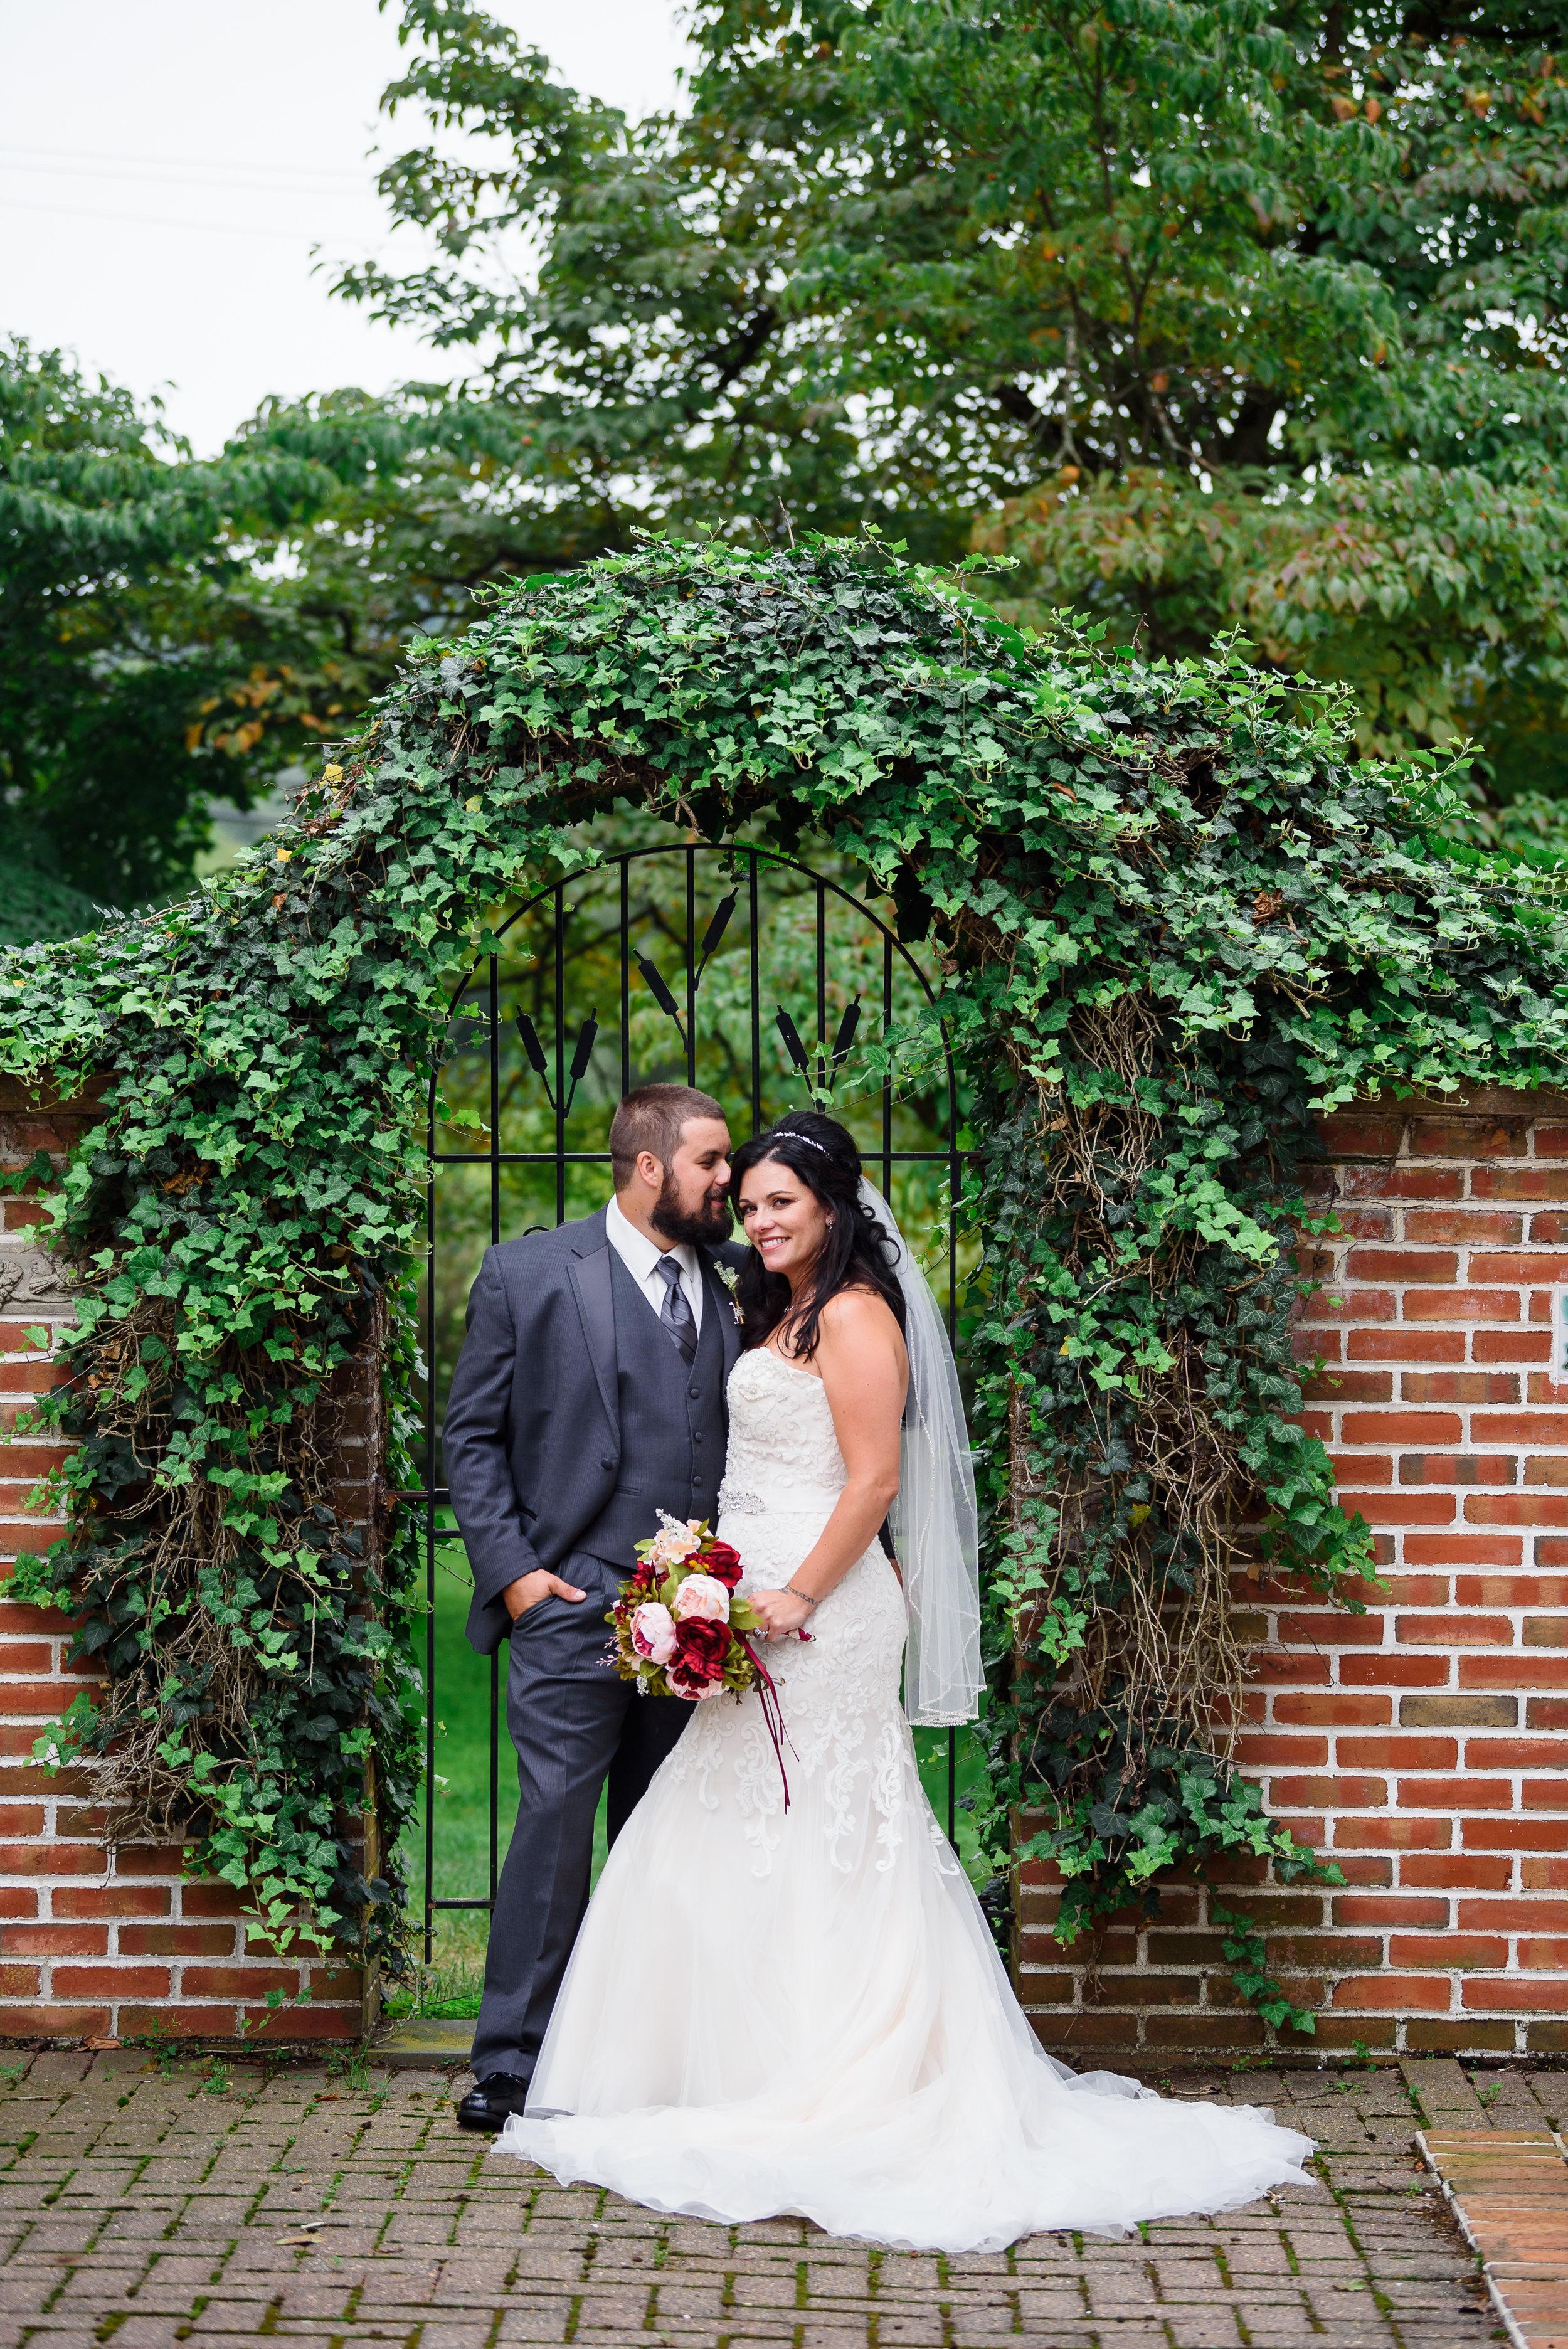 Heather-Jared-Wedding-Garcia-Photography-1120.jpg